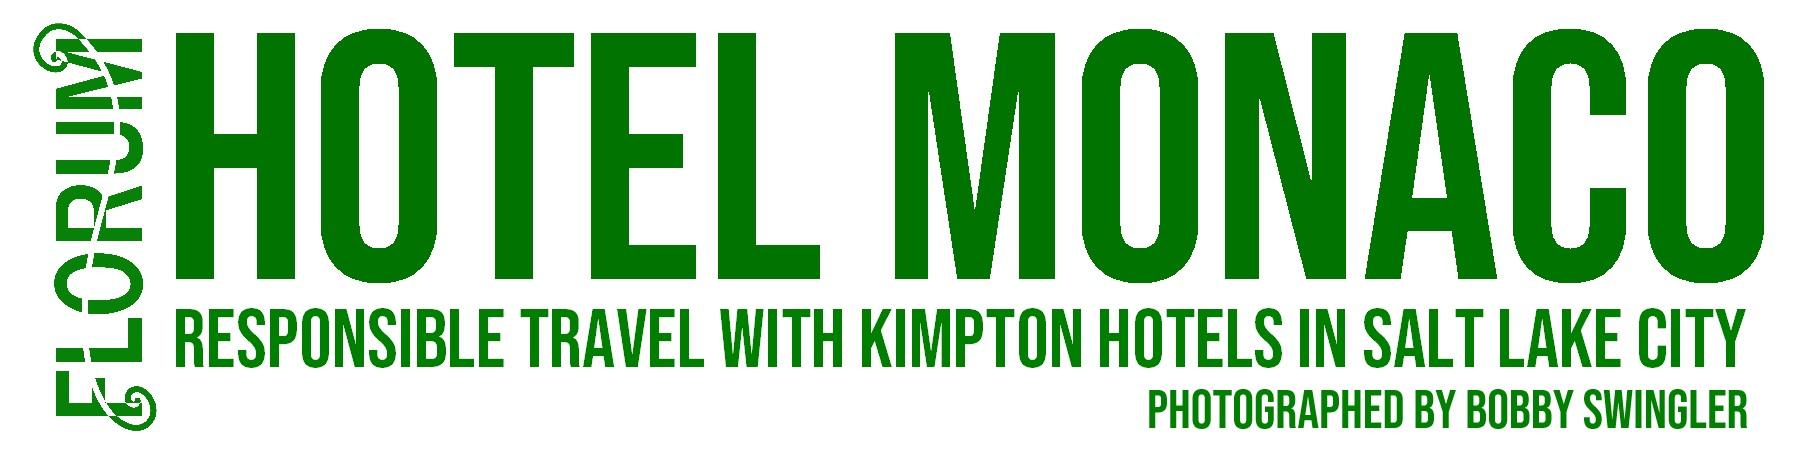 Salt Lake City - Hotel Monaco - Florum Fashion Magazine - Bobby Swingler - Ethical winter fashion - eco travel - kimpton hotels responsible trips.jpg